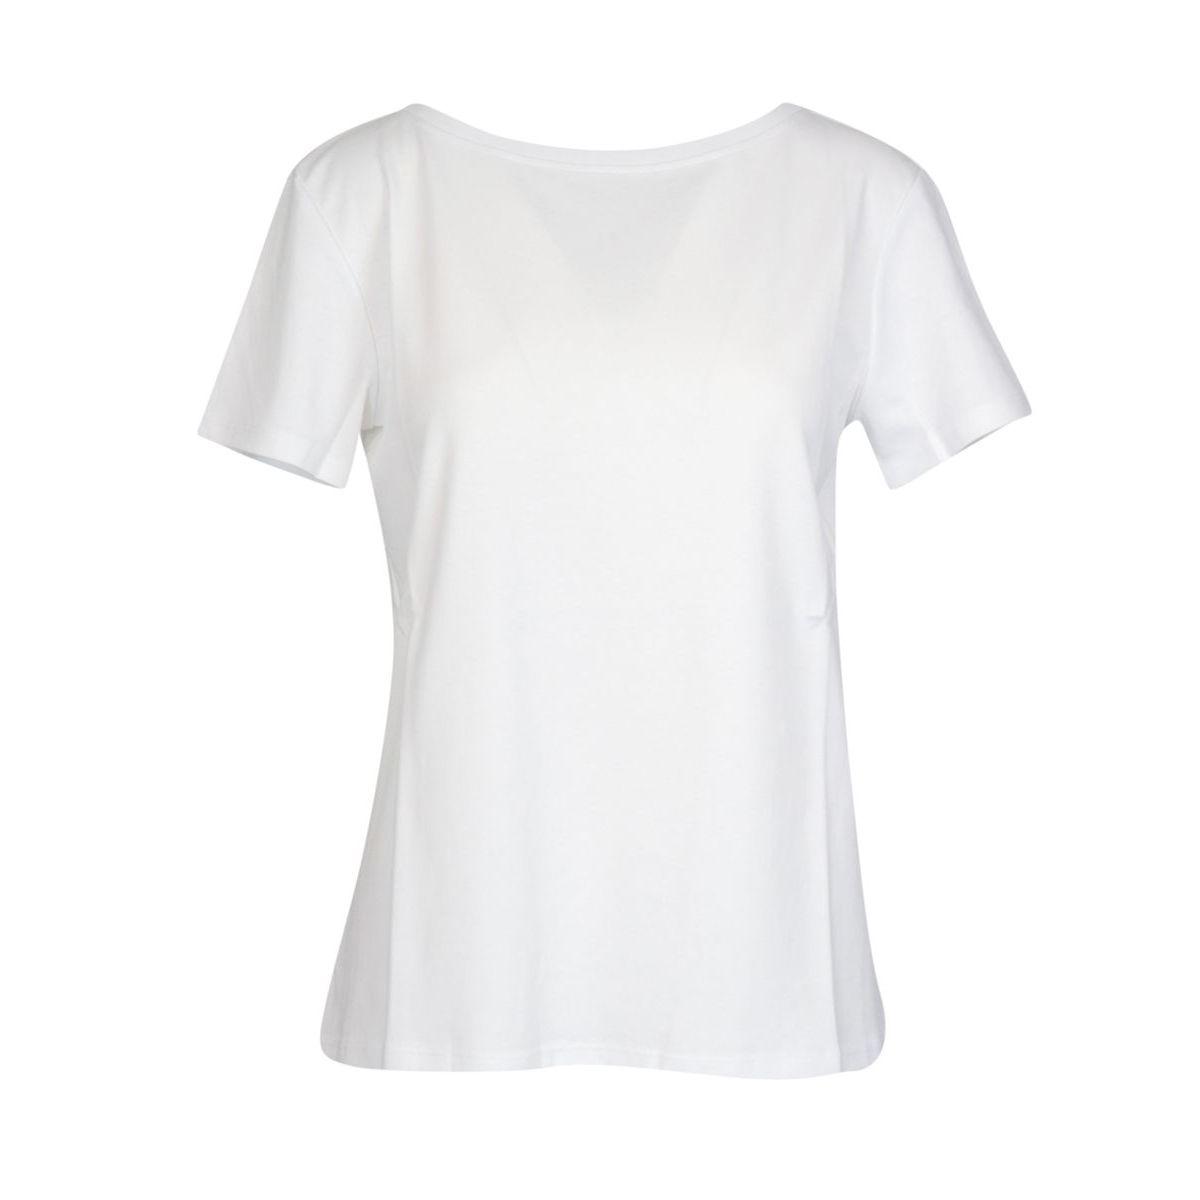 SVELTO short-sleeved T-shirt in cotton jersey Optical white MAX MARA STUDIO